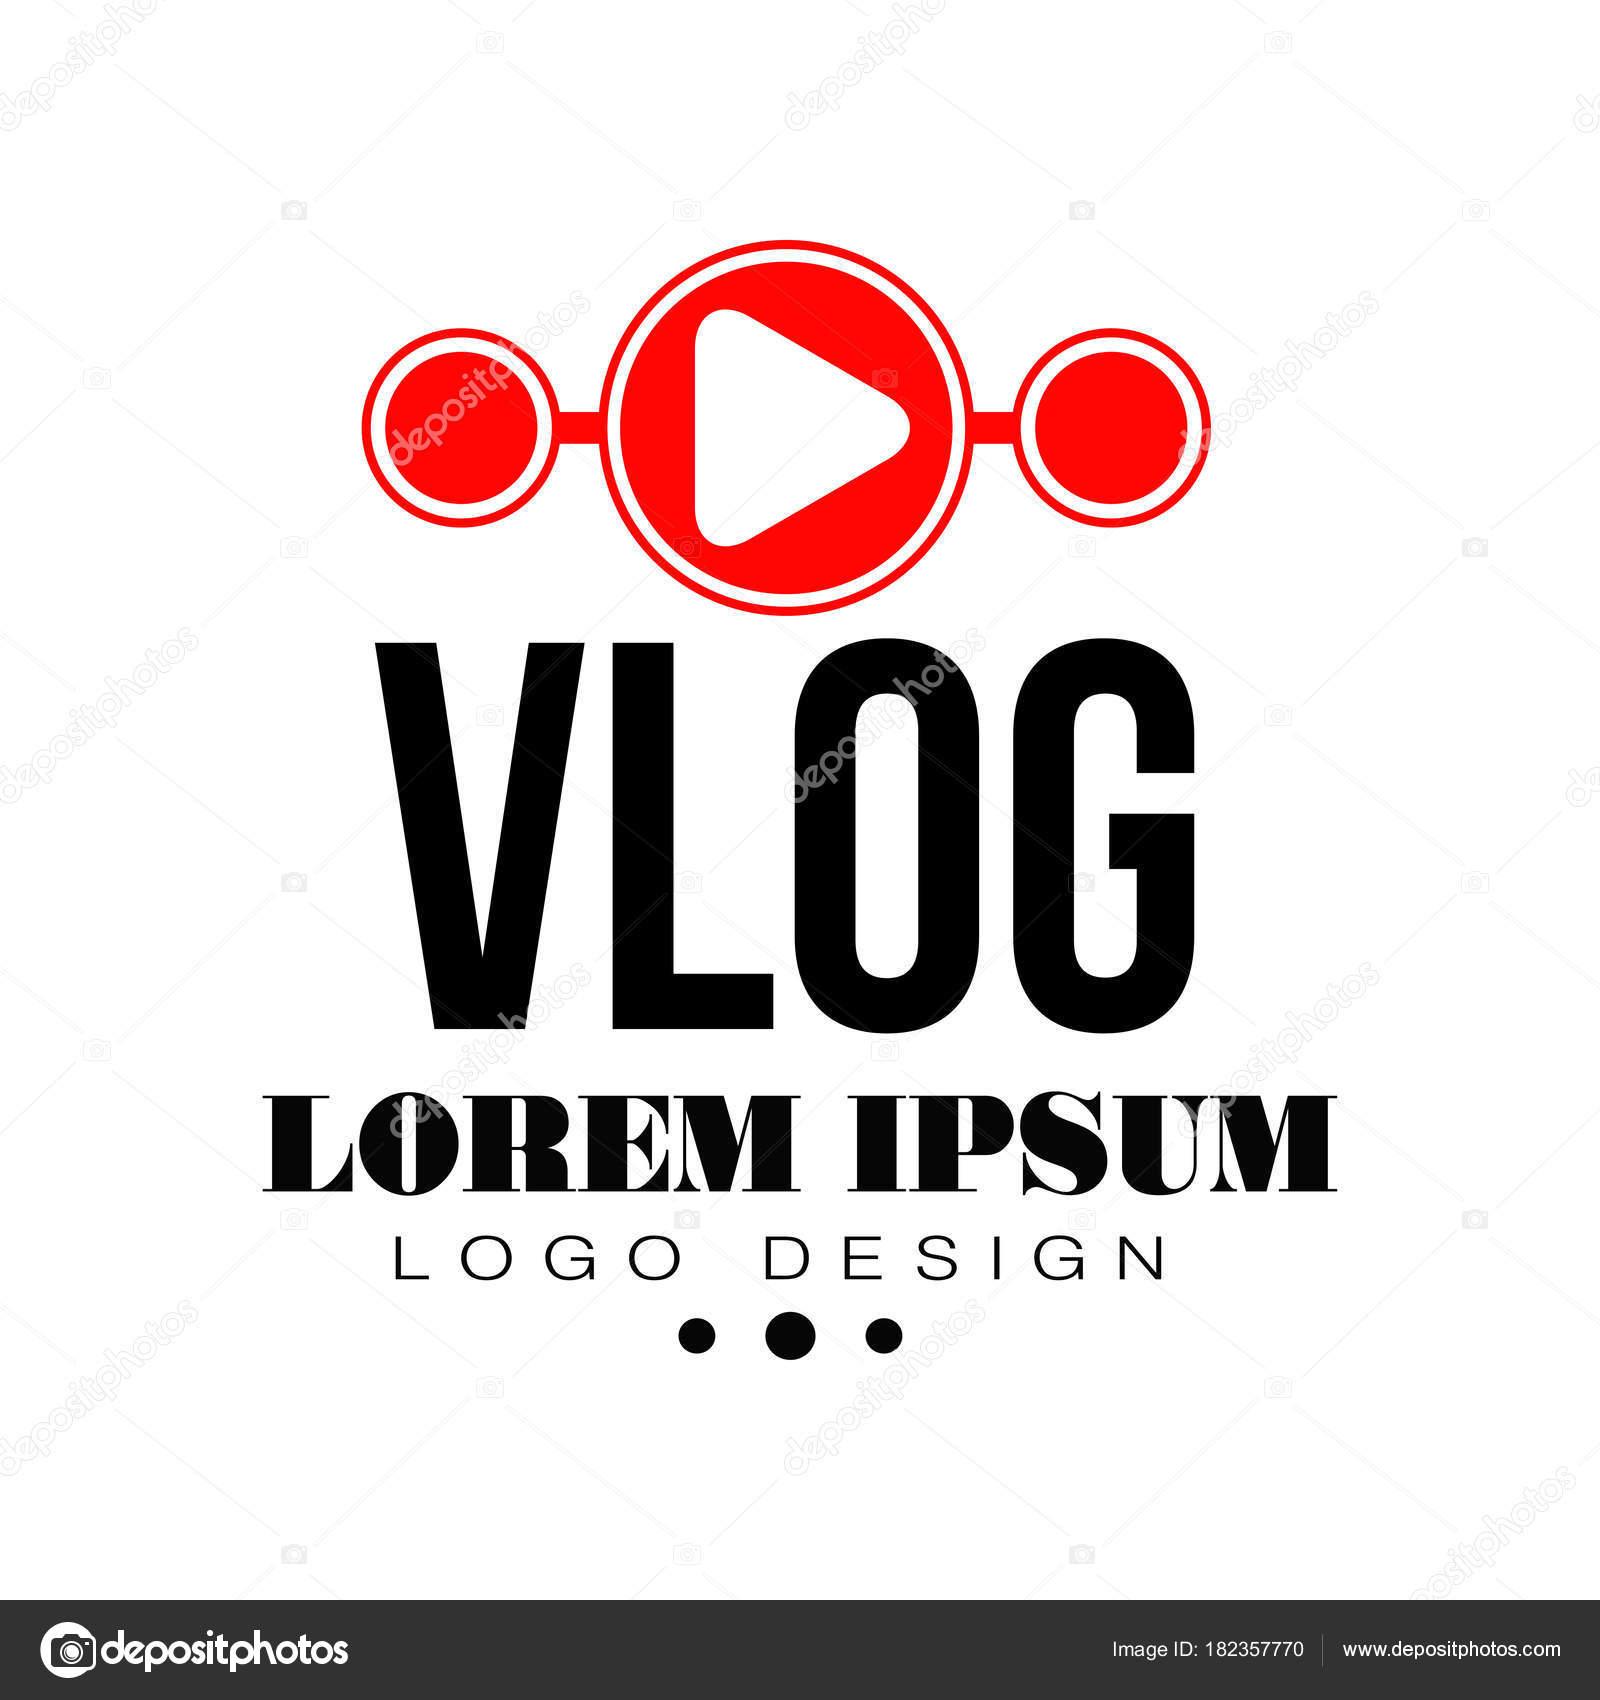 livestream video download online